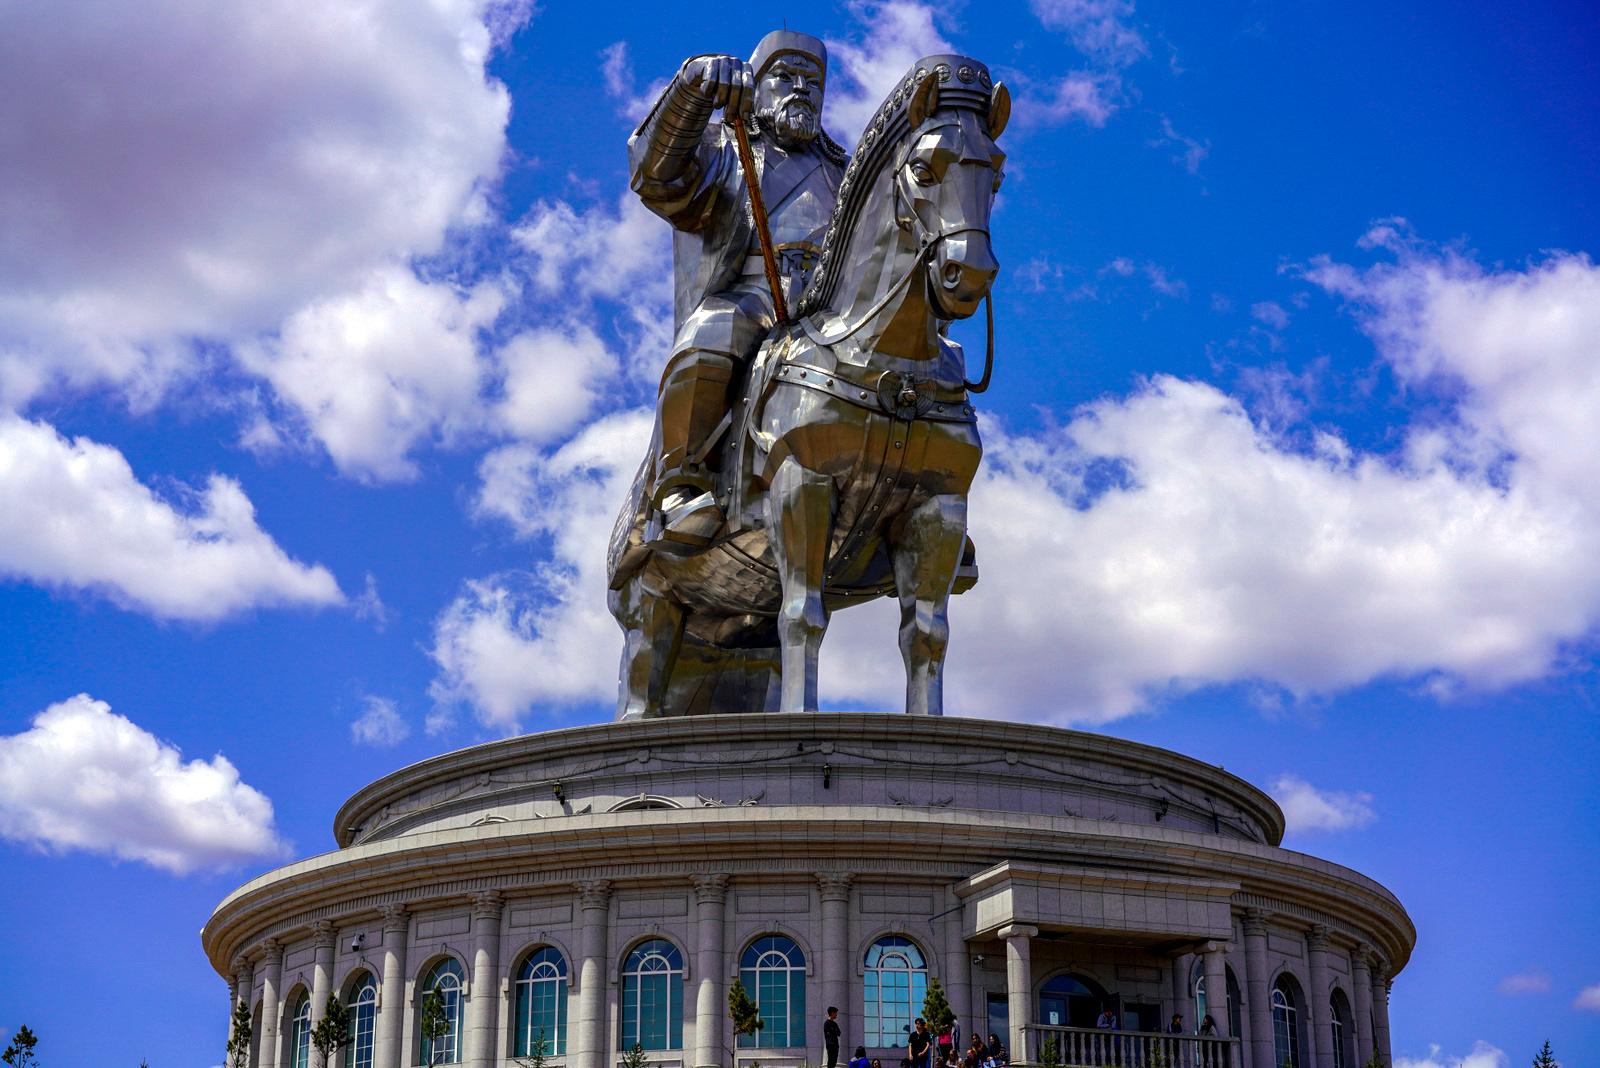 The Bar At Genghis Khan Equestrian Statue, Mongolia